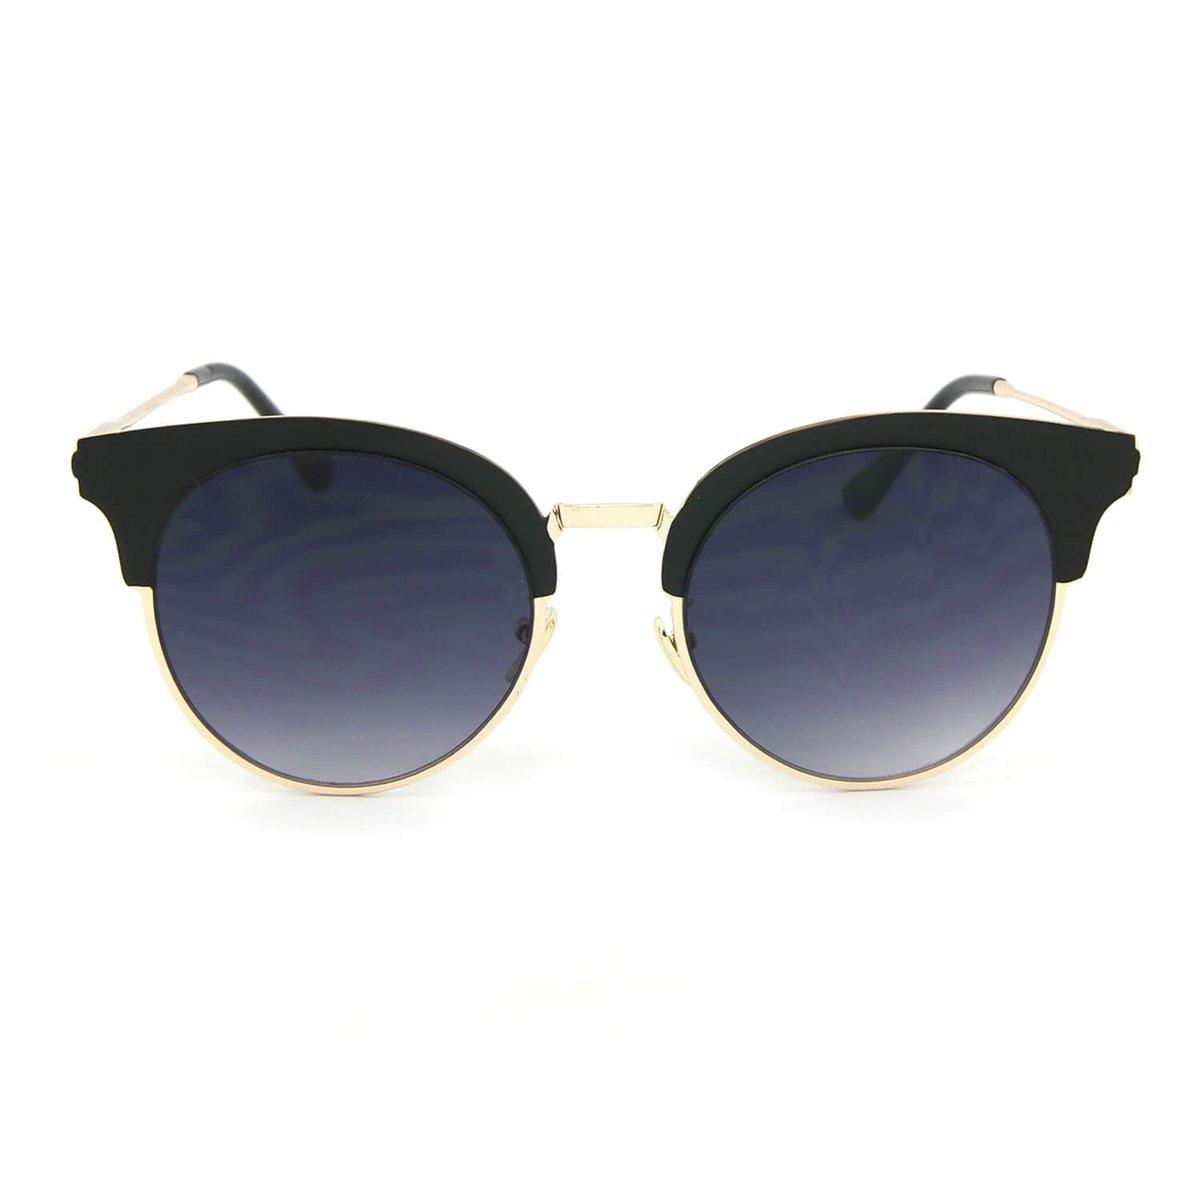 Óculos de Sol Redondo Gatinha Style Fosco - Preto - Compre Agora ... 516fc6ac73